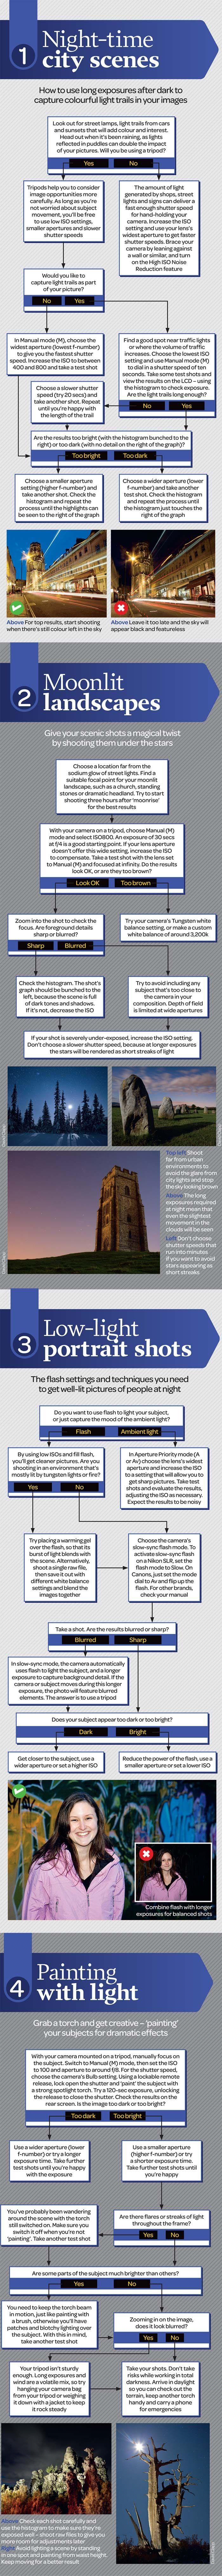 Free night photography cheat sheet: shoot any low-light scene